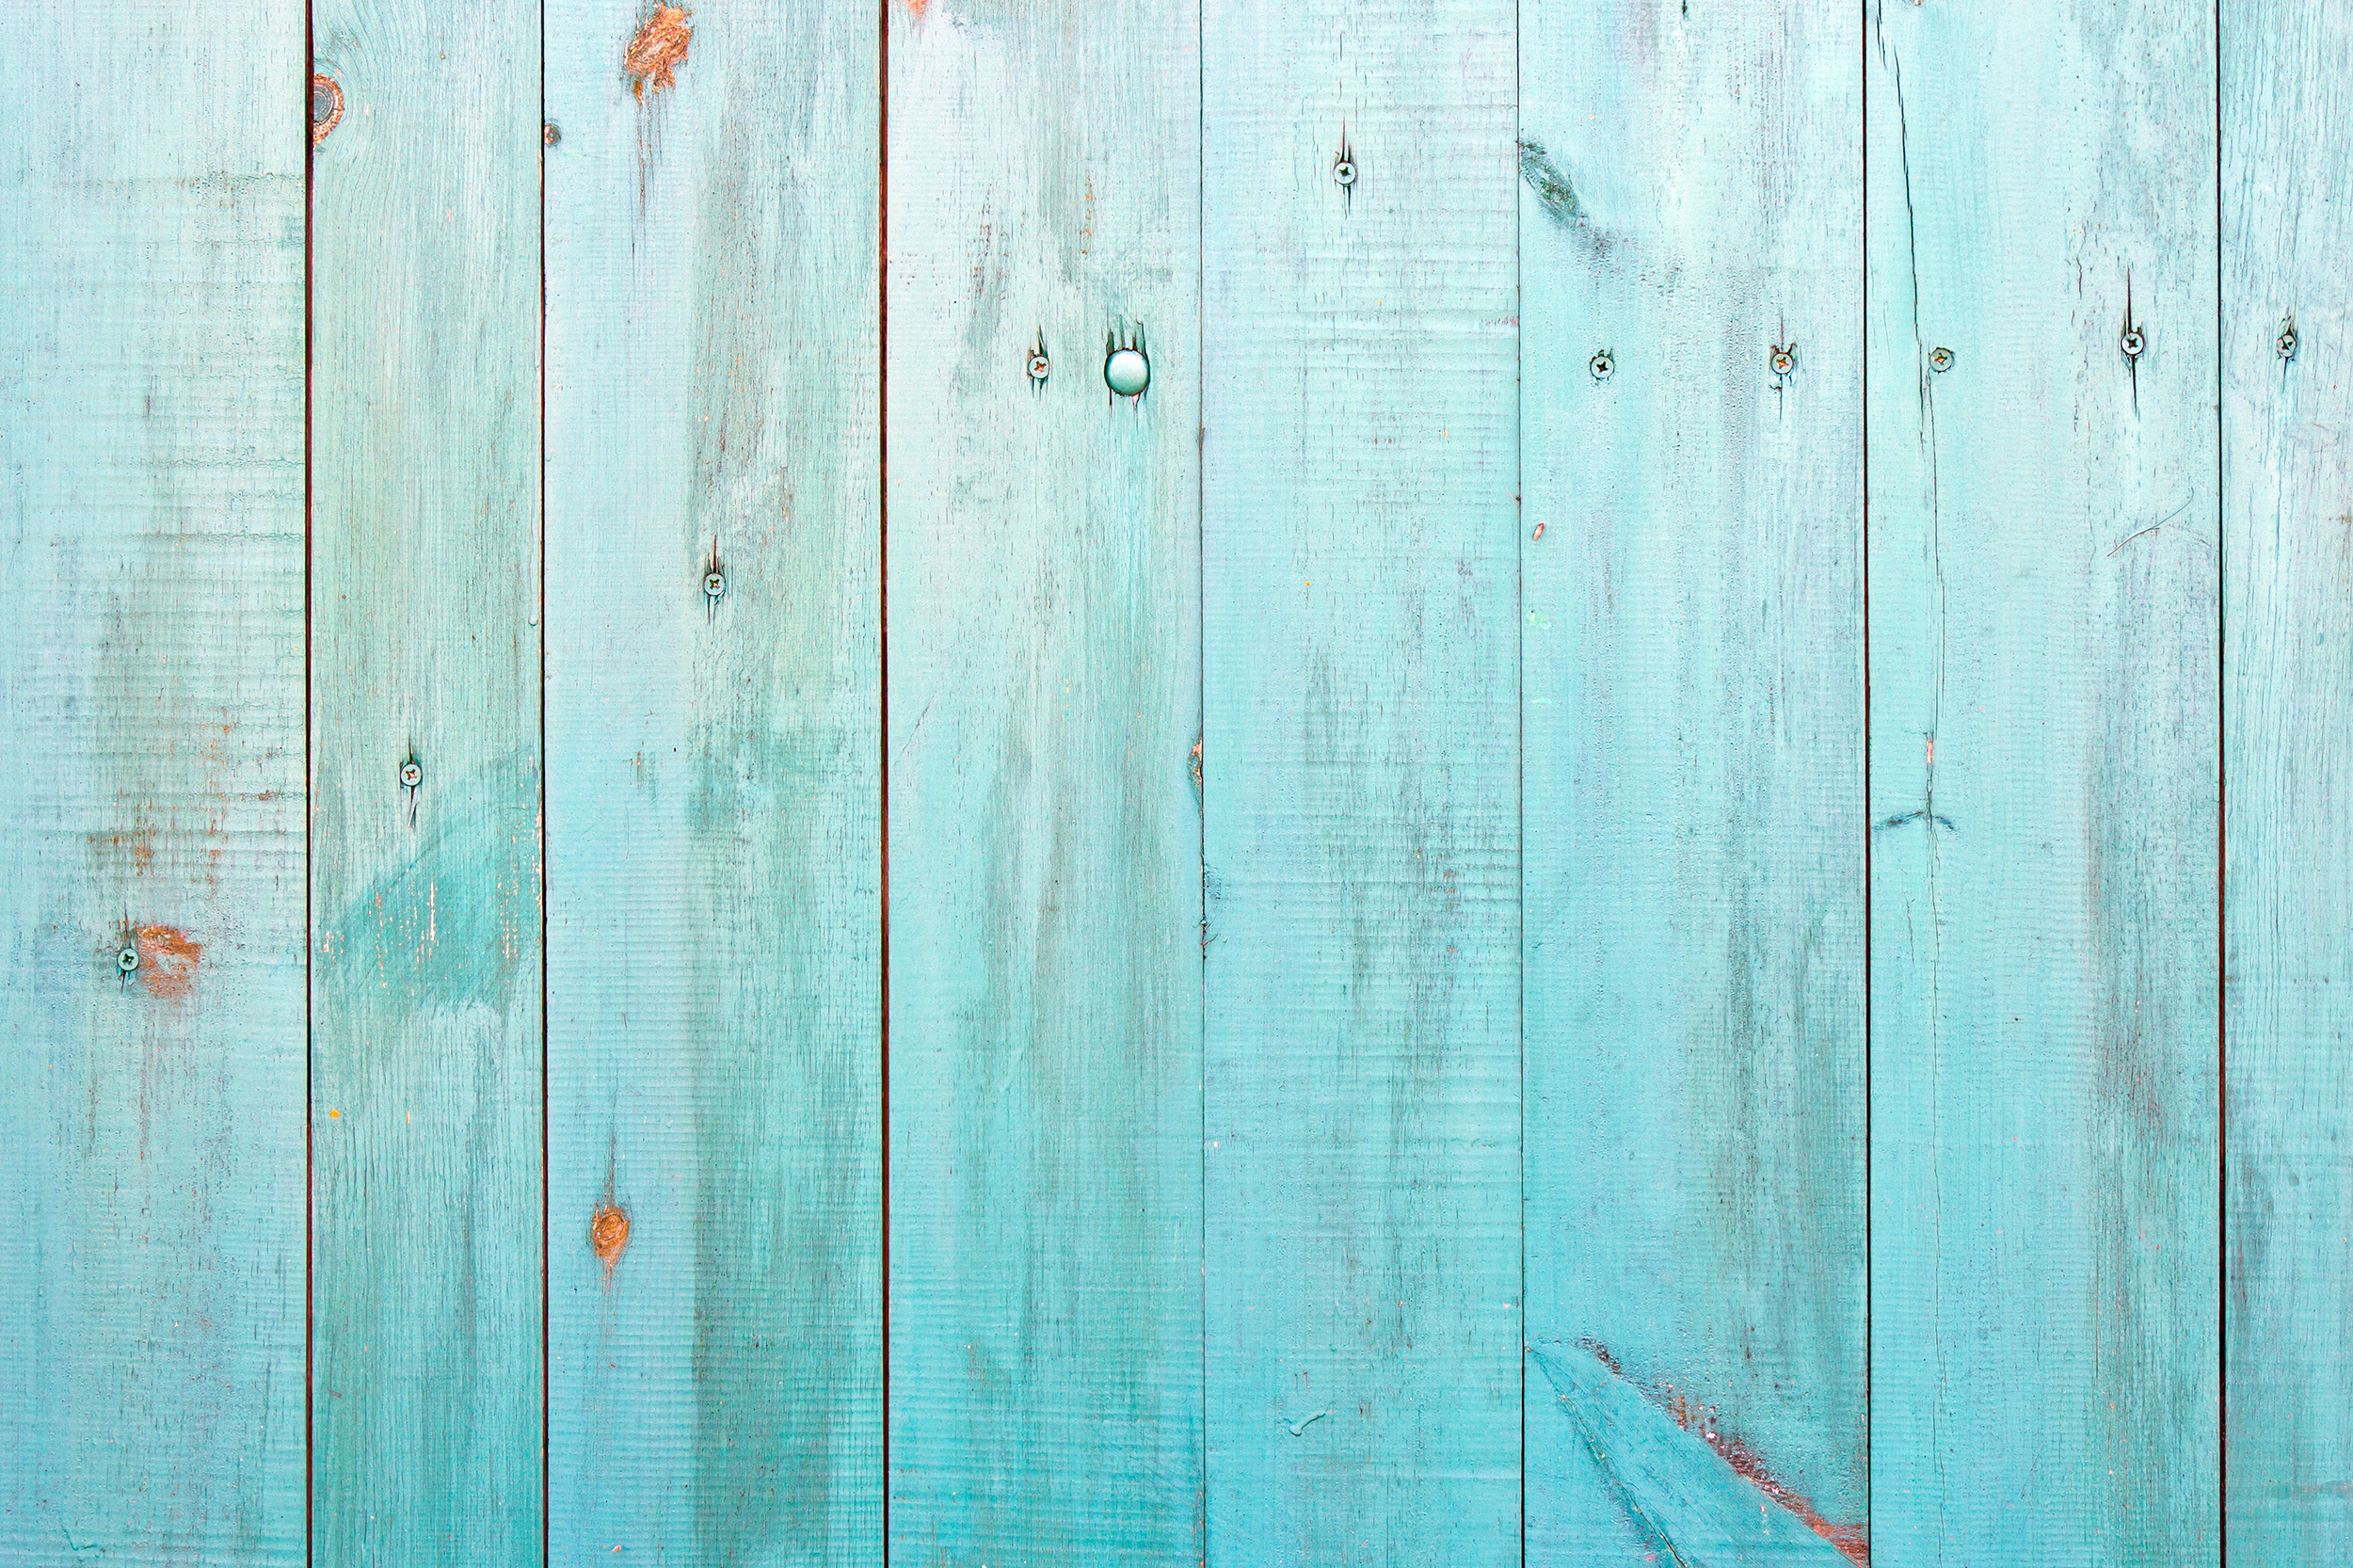 Easy Glass Splashbacks Textured Blue Painted Wood